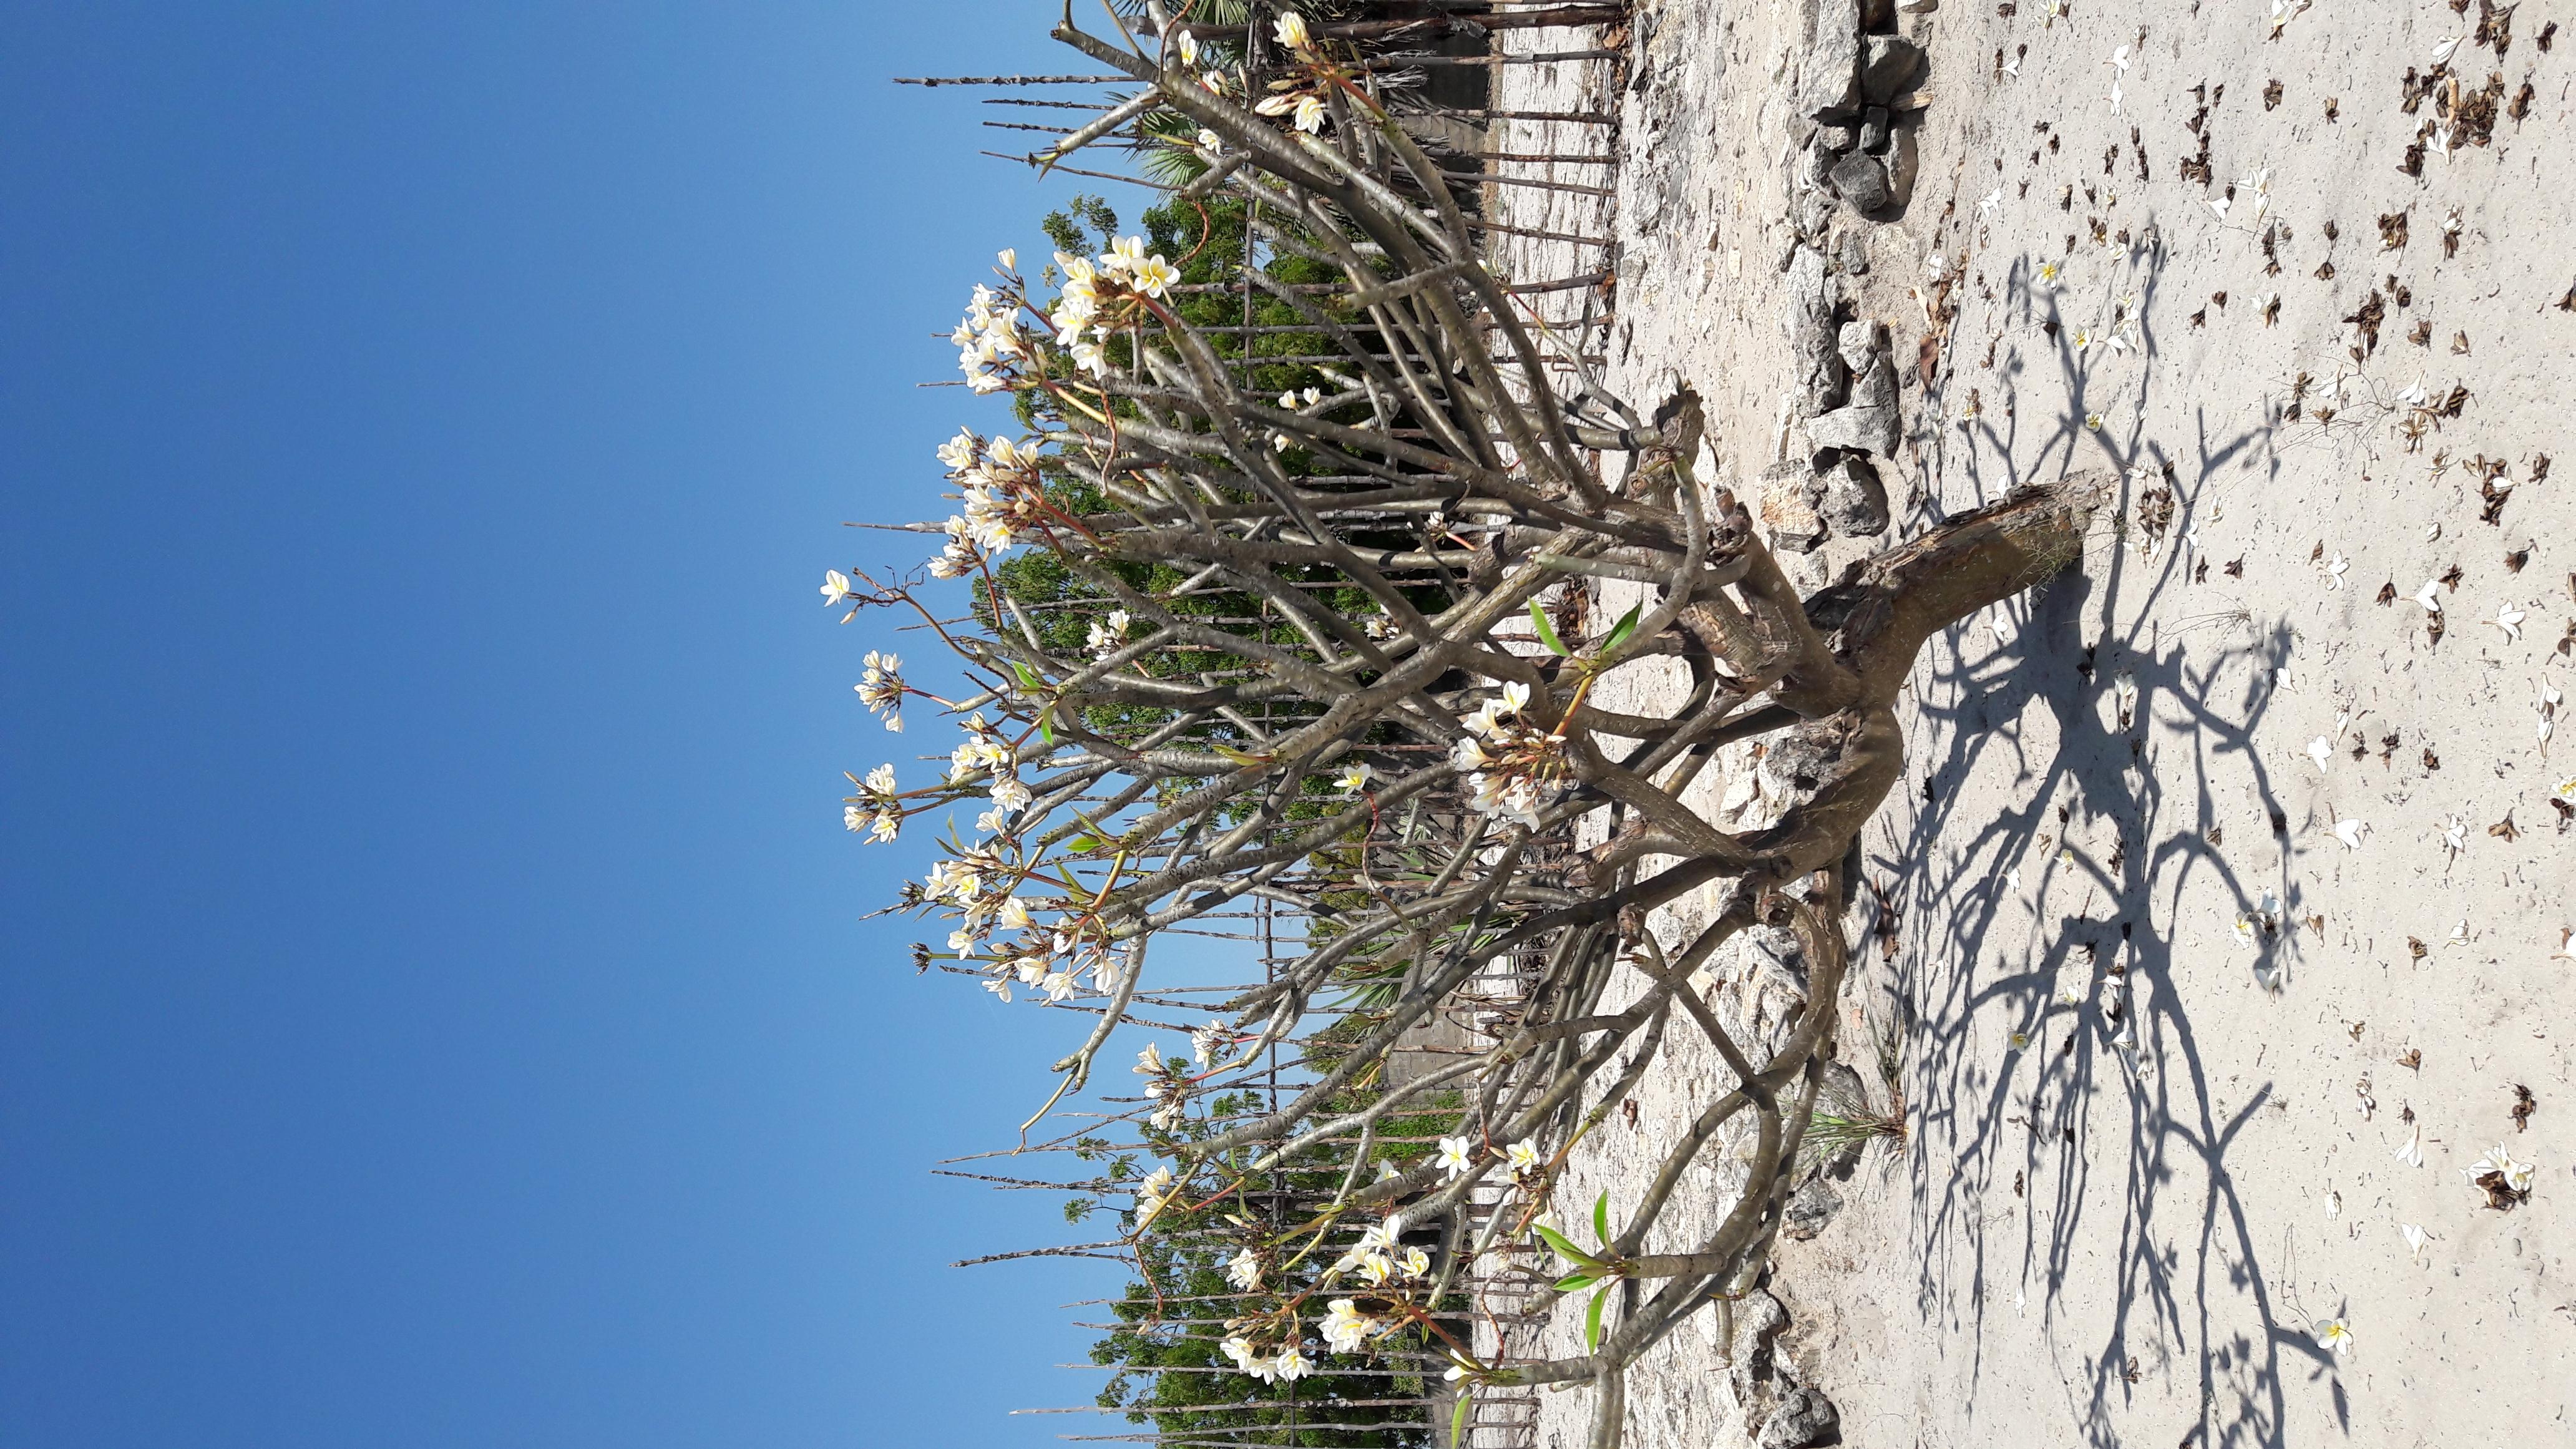 arbre plante blanche